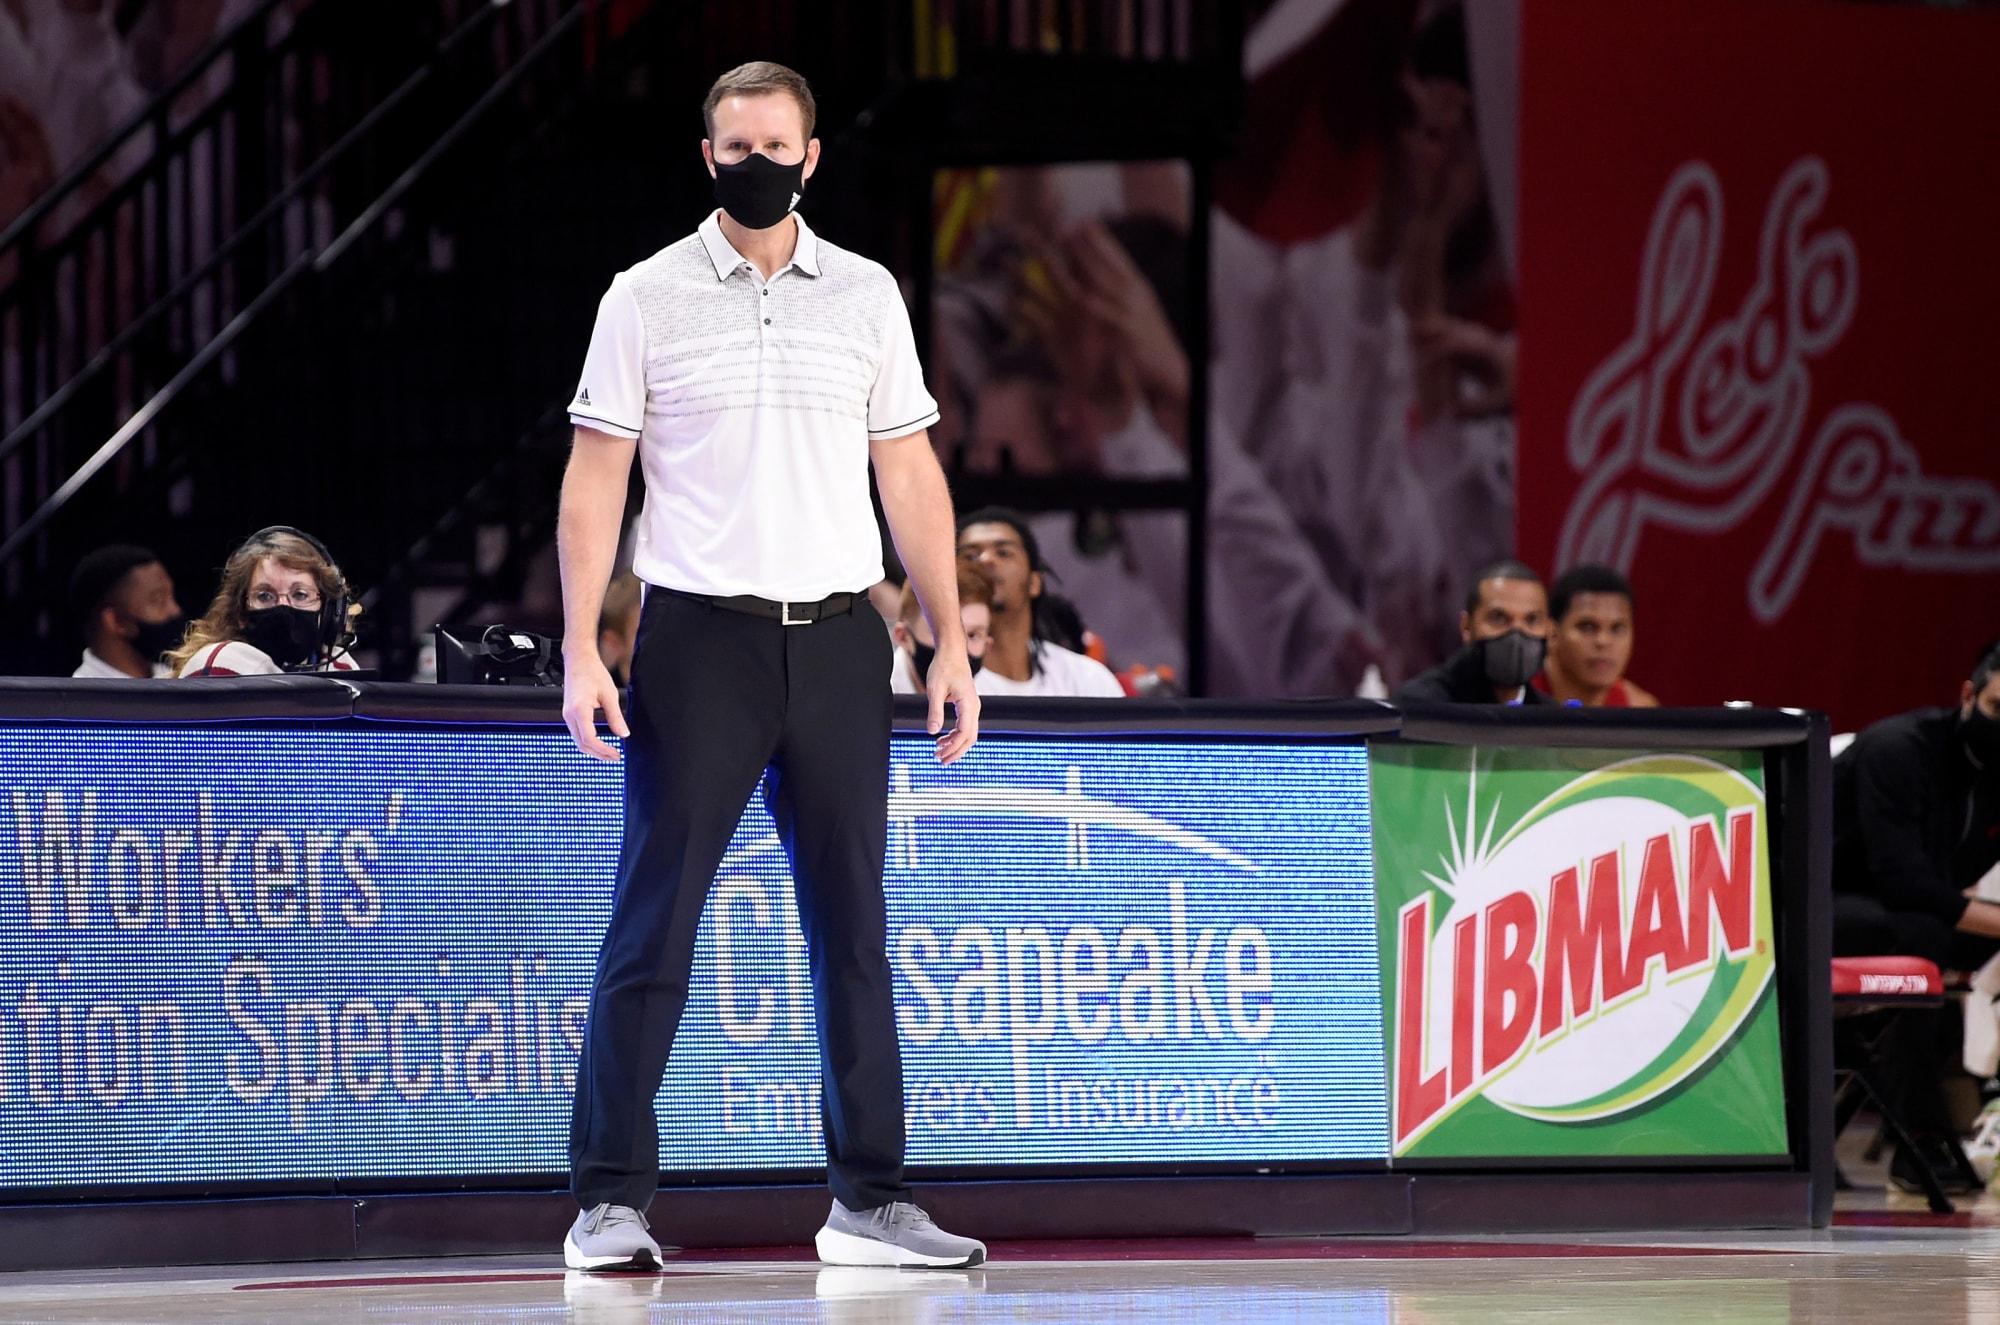 Nebraska Basketball: Kojenets Makes it Official By Signing With Program